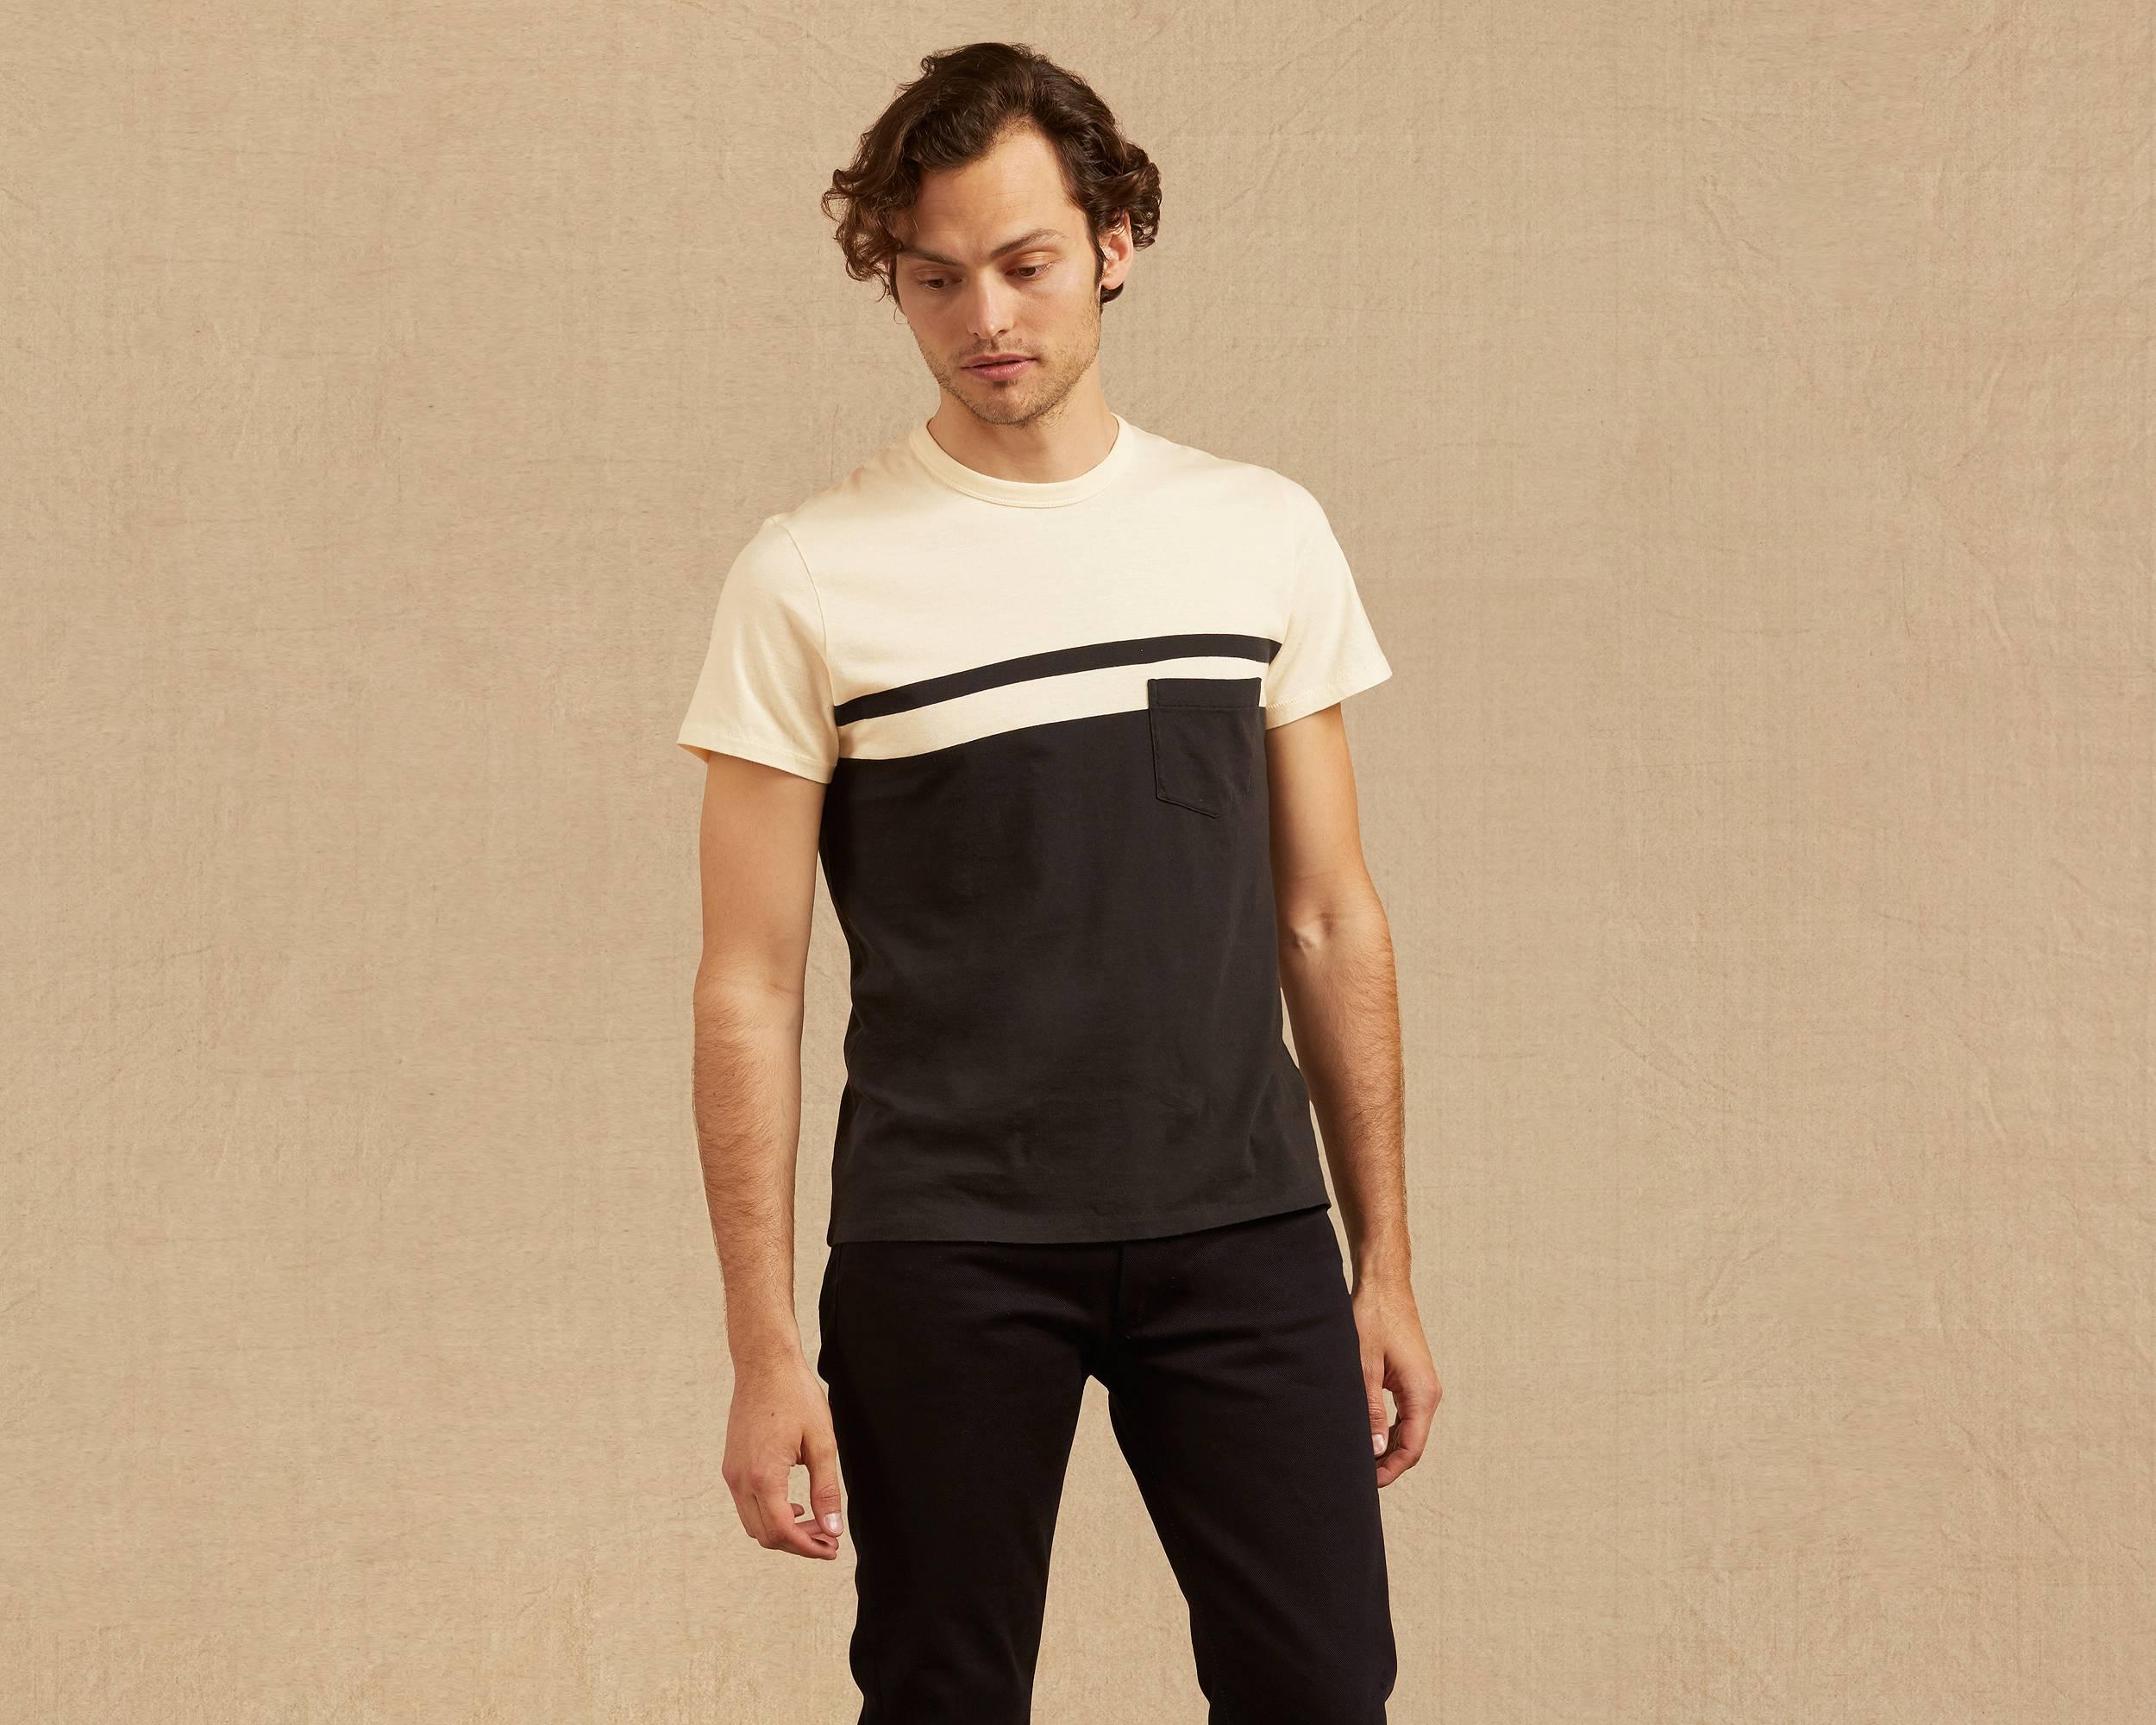 1960s Mens Shirts- Dress, Mod, T-Shirt, Turtleneck 1960s Casuals Stripe T-Shirt $88.00 AT vintagedancer.com